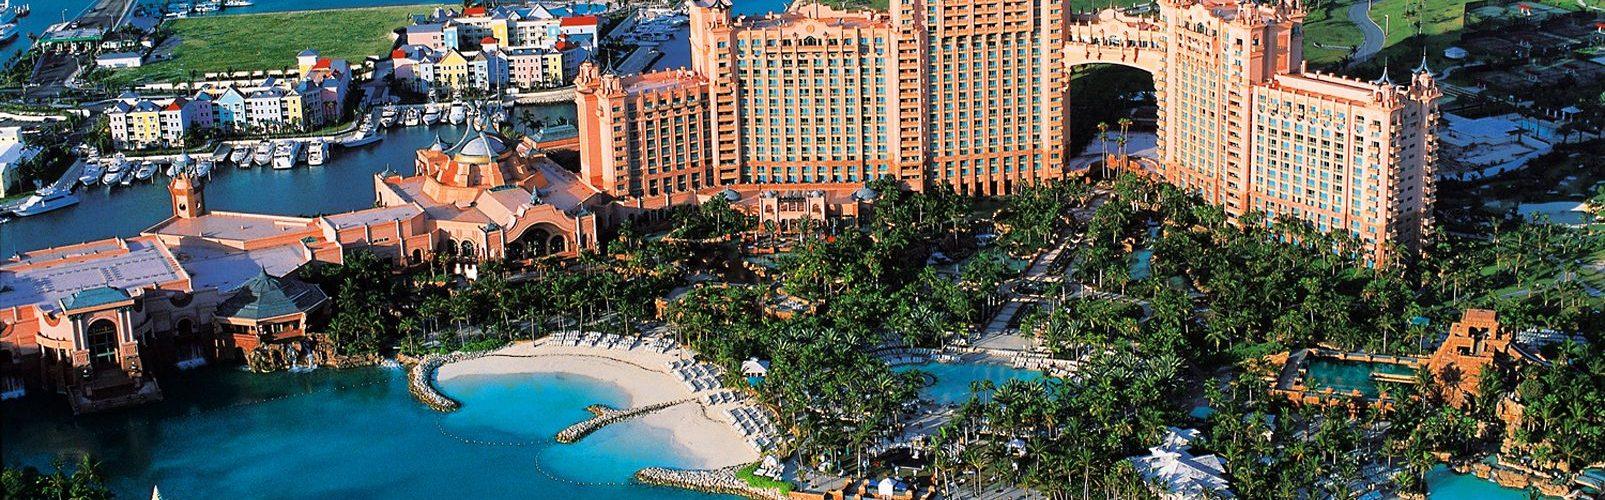 Atlantis Bahamas hotels easyflights.net